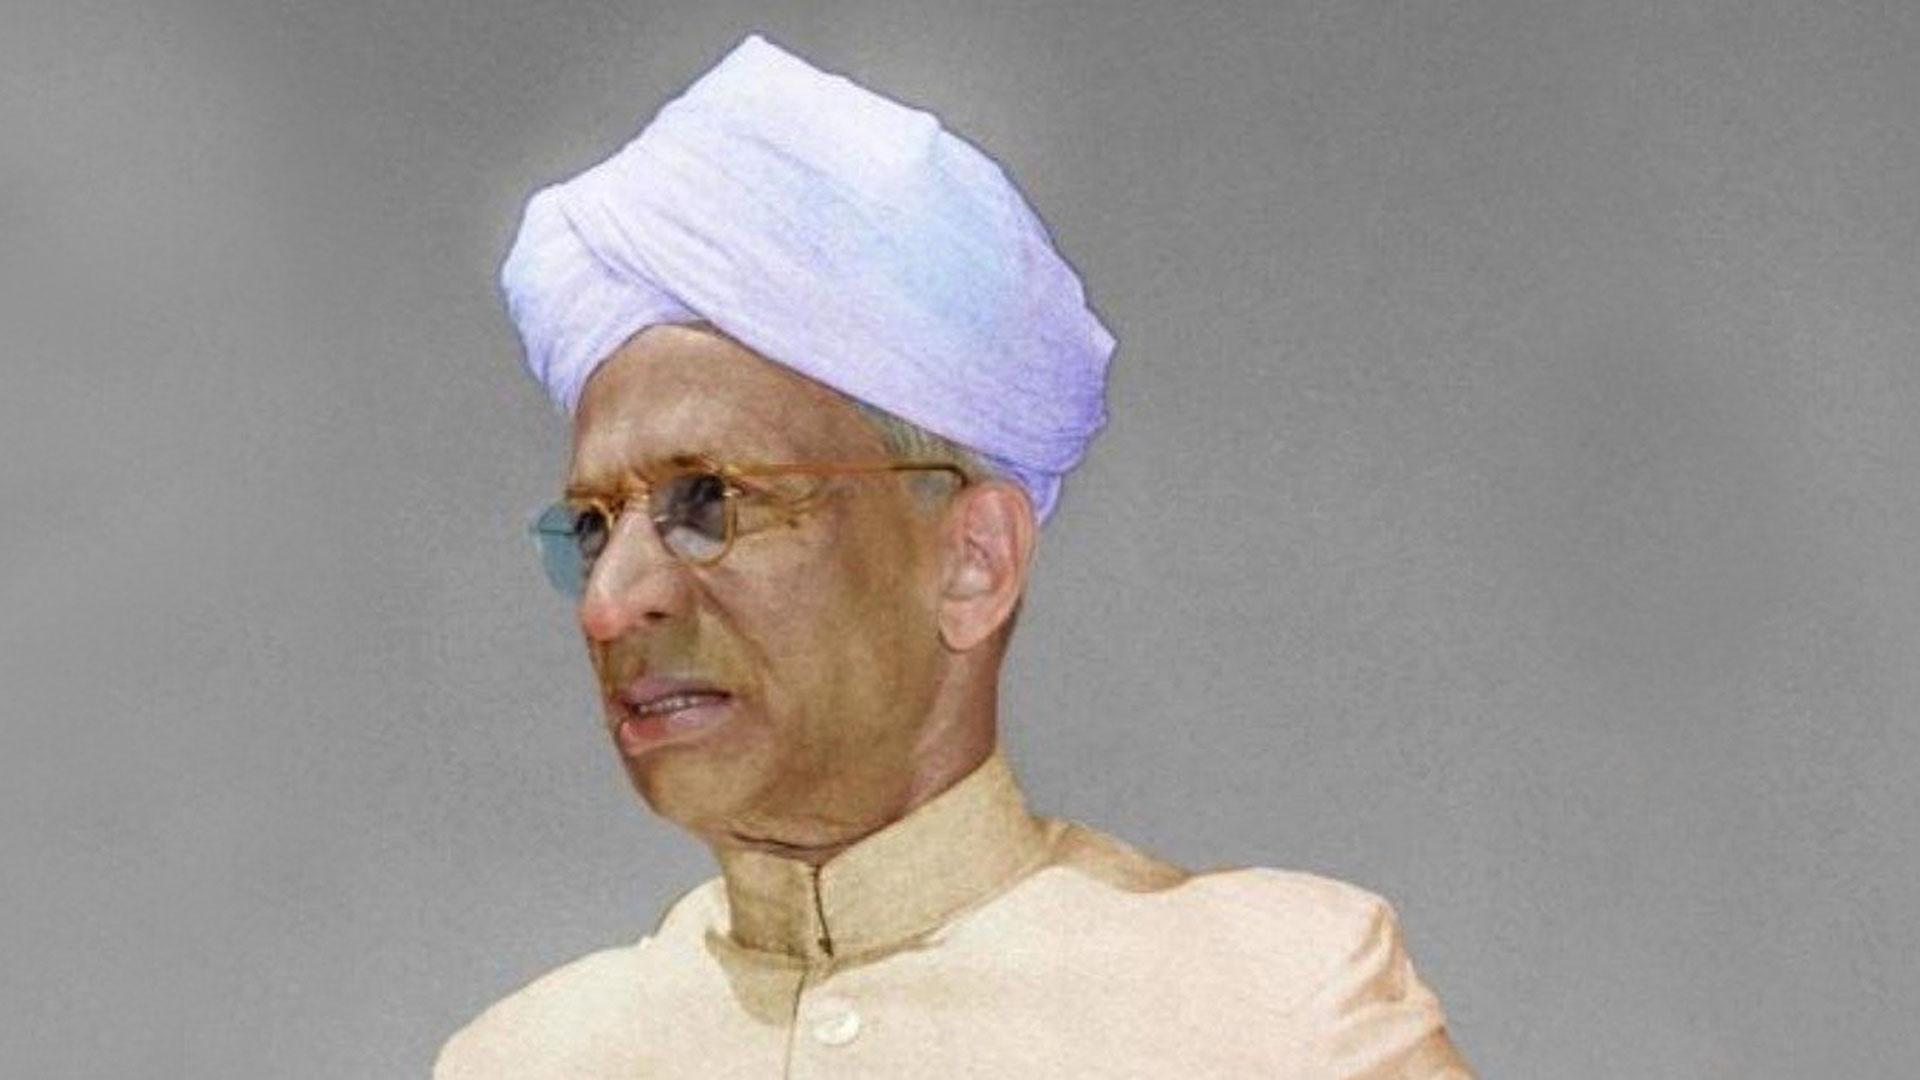 We Bow To Shri Sarvepalli Radhakrishnan On His 132nd Birth Anniversary